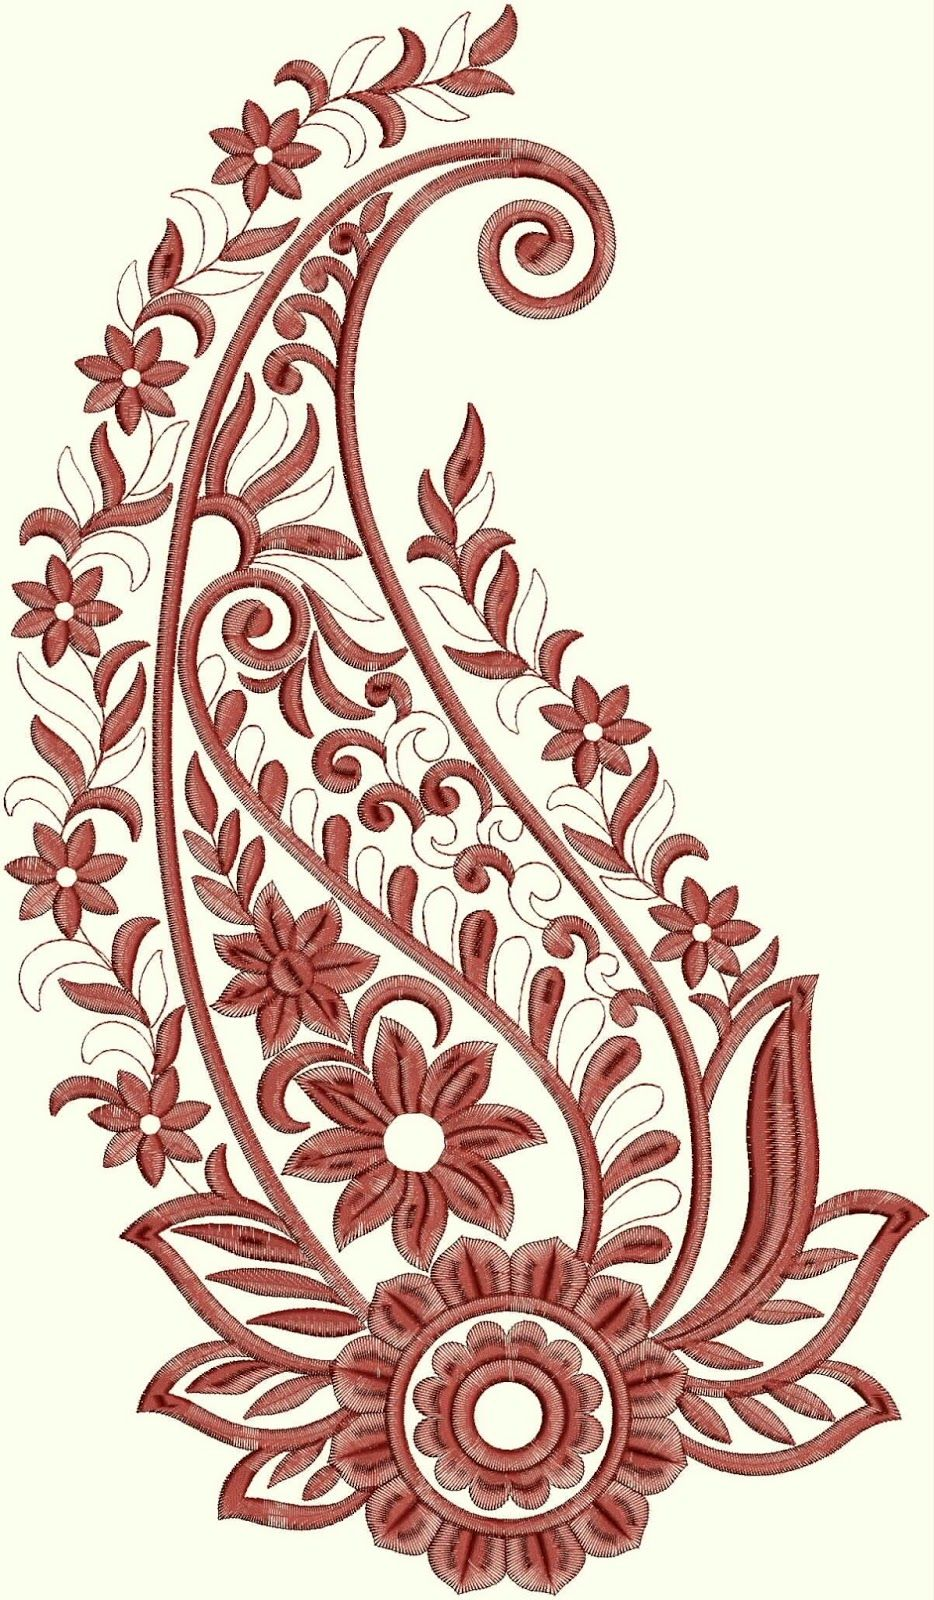 paisley patterns - Google Search | EMBROIDRY | Paisley ...